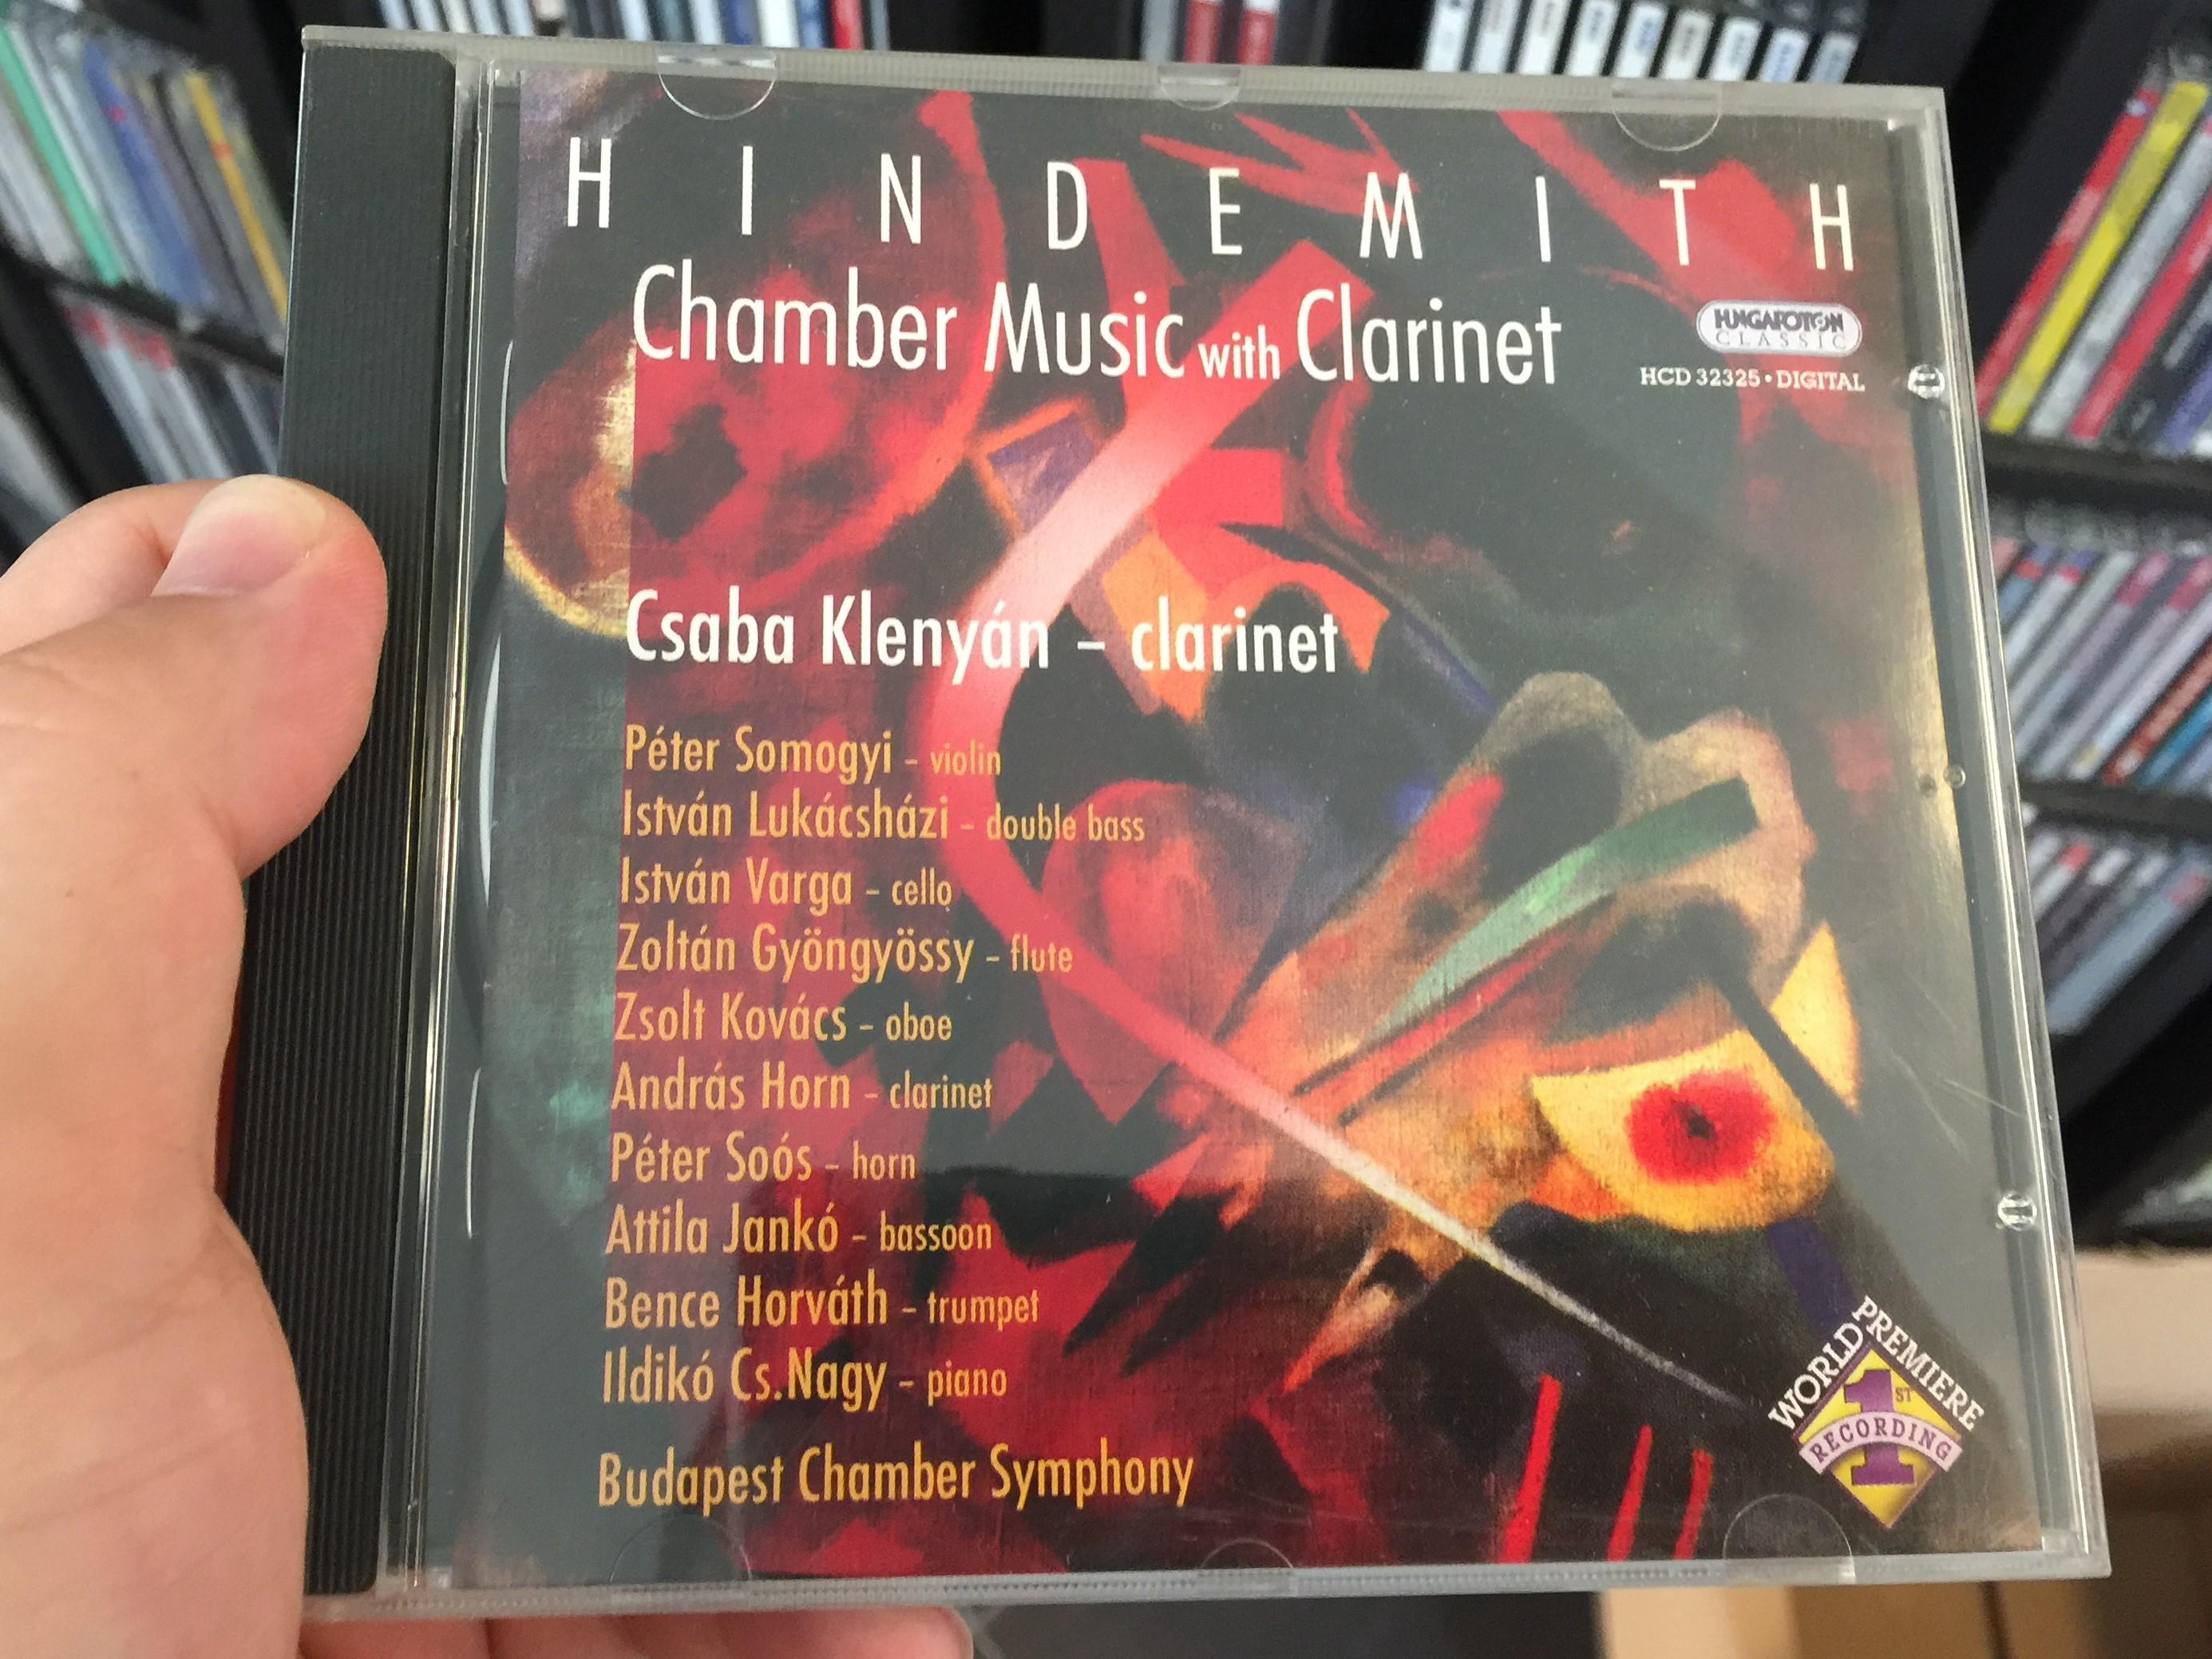 hindemith-chamber-music-with-clarinet-csaba-klenyain-clarinet-peter-somogyi-istvan-lukacshazi-istvan-varga-zoltan-gyongyossy-budapest-chamber-symphony-hungaroton-classic-audio-cd-2006-s-1-.jpg